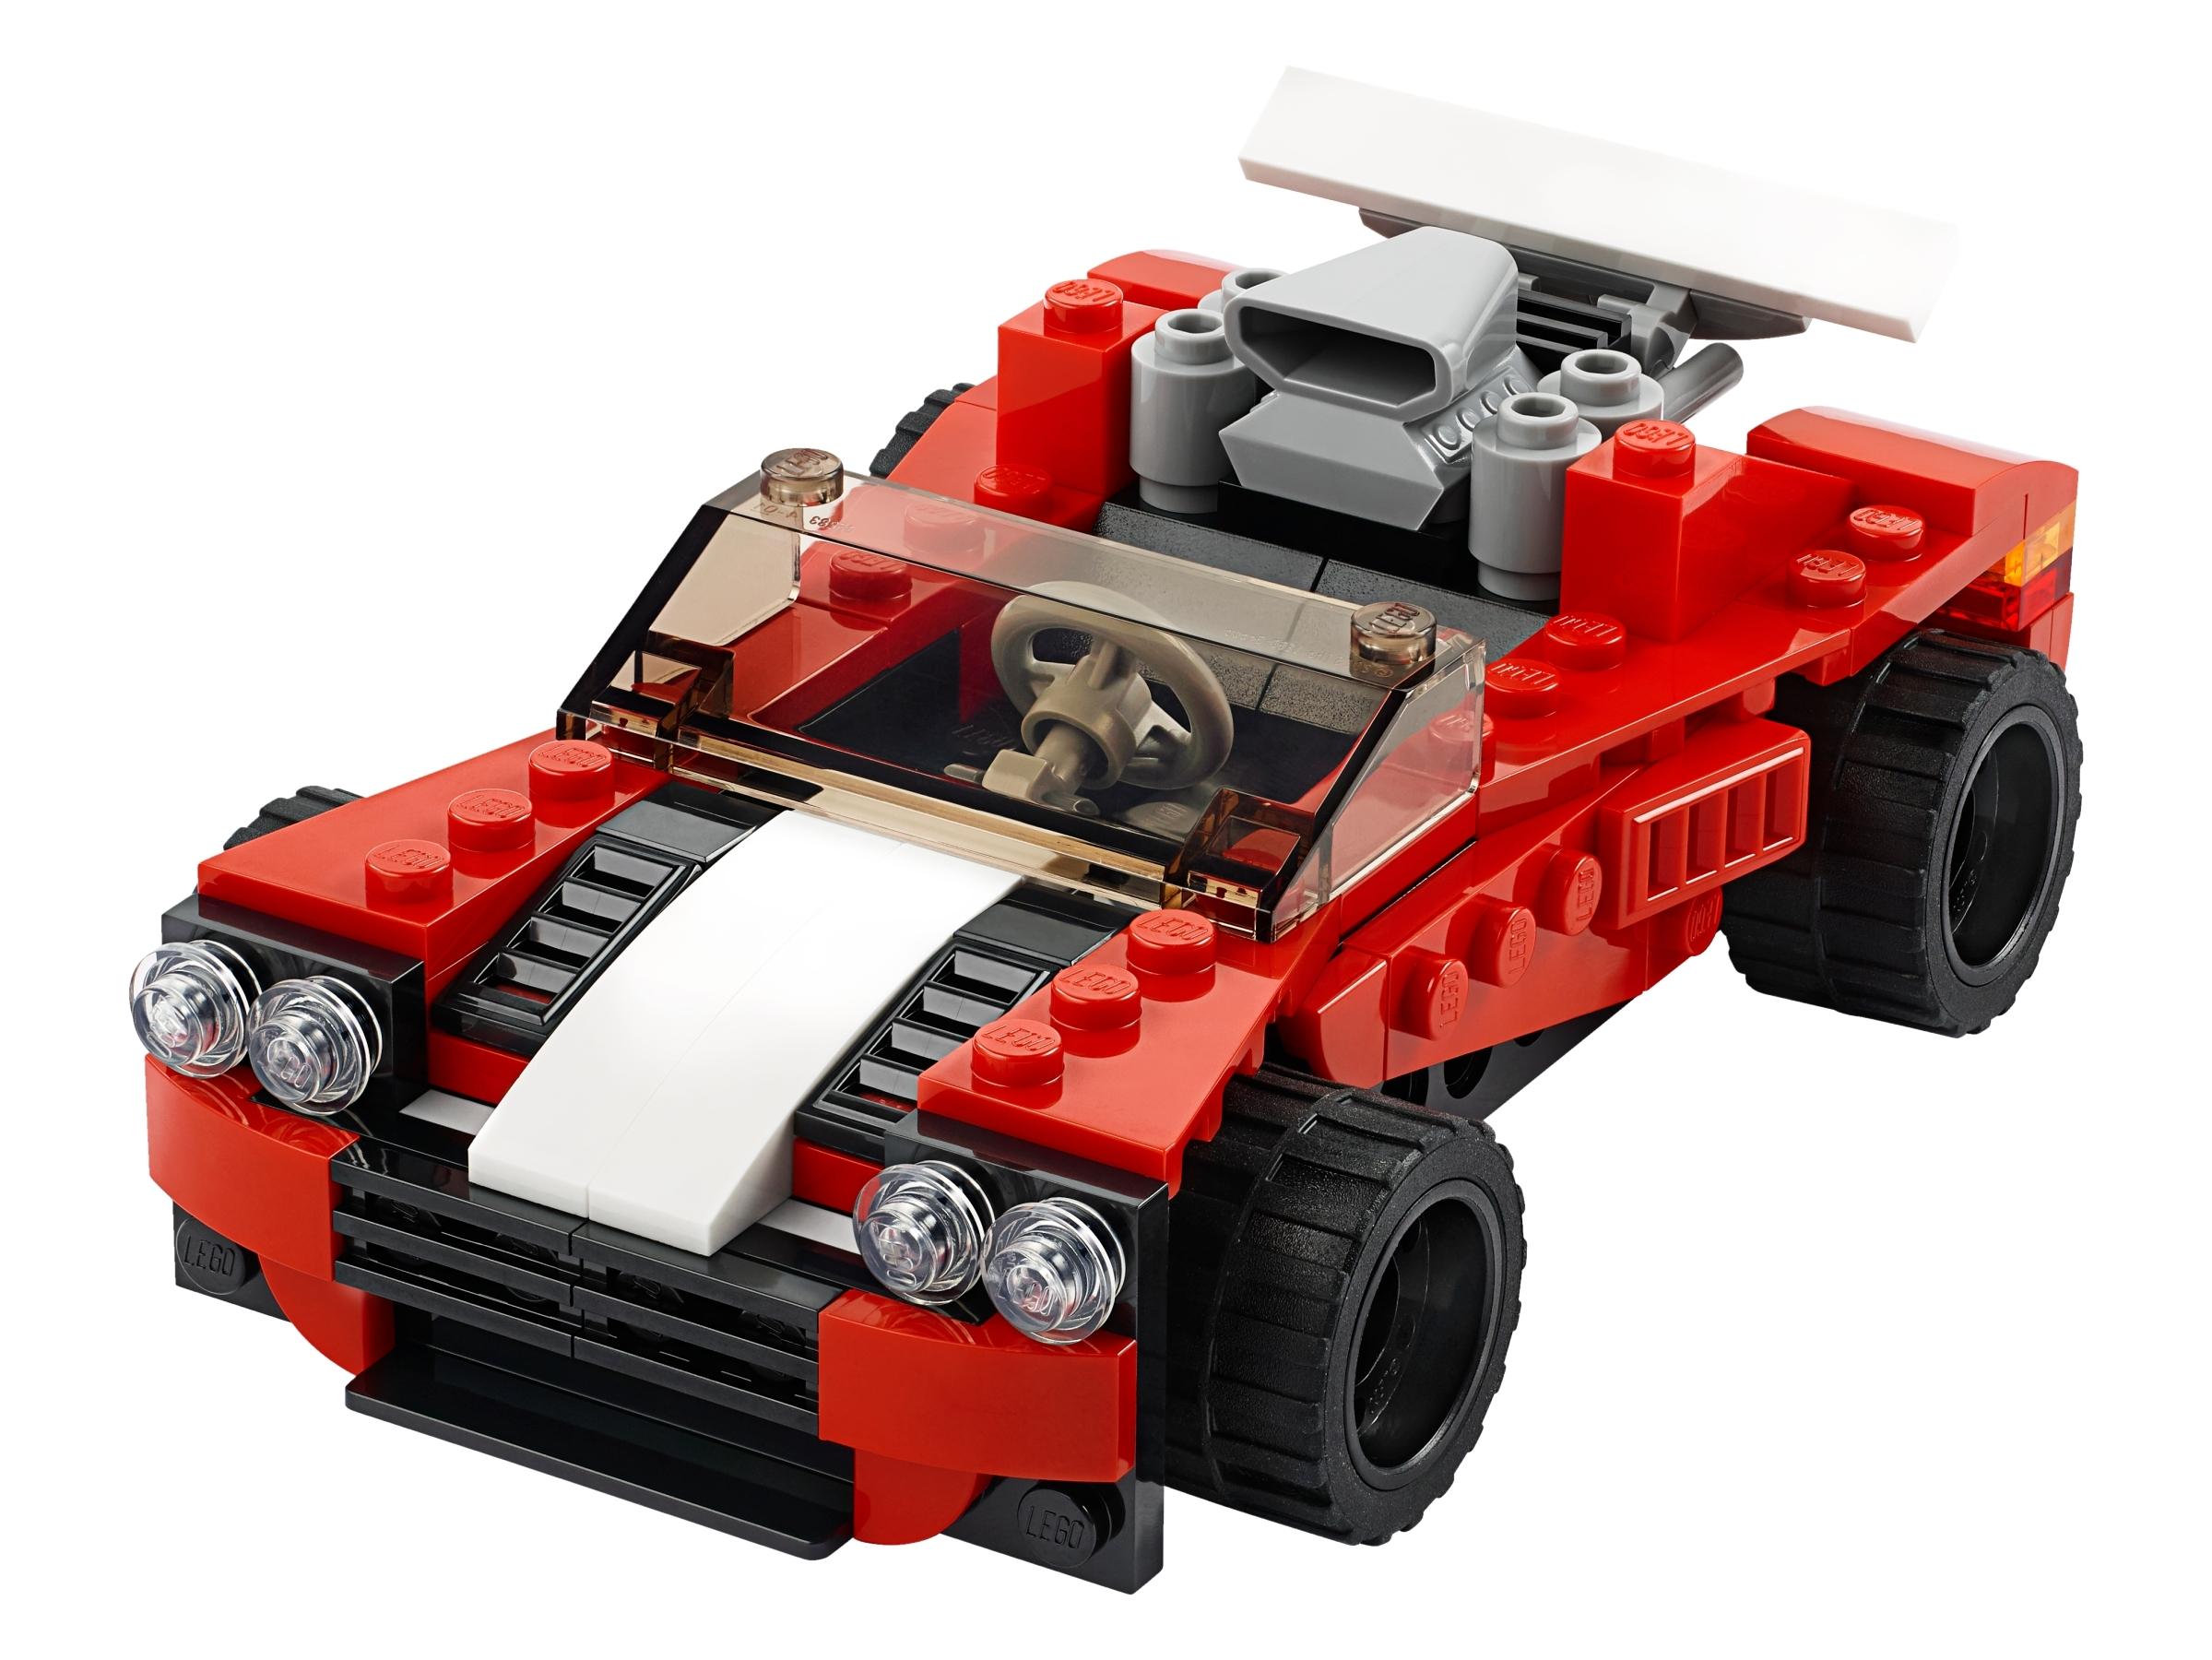 LEGO Creator 3in1 Sports Car Plane Hot Rod 31100 134 Piece Building Toy Age 6+